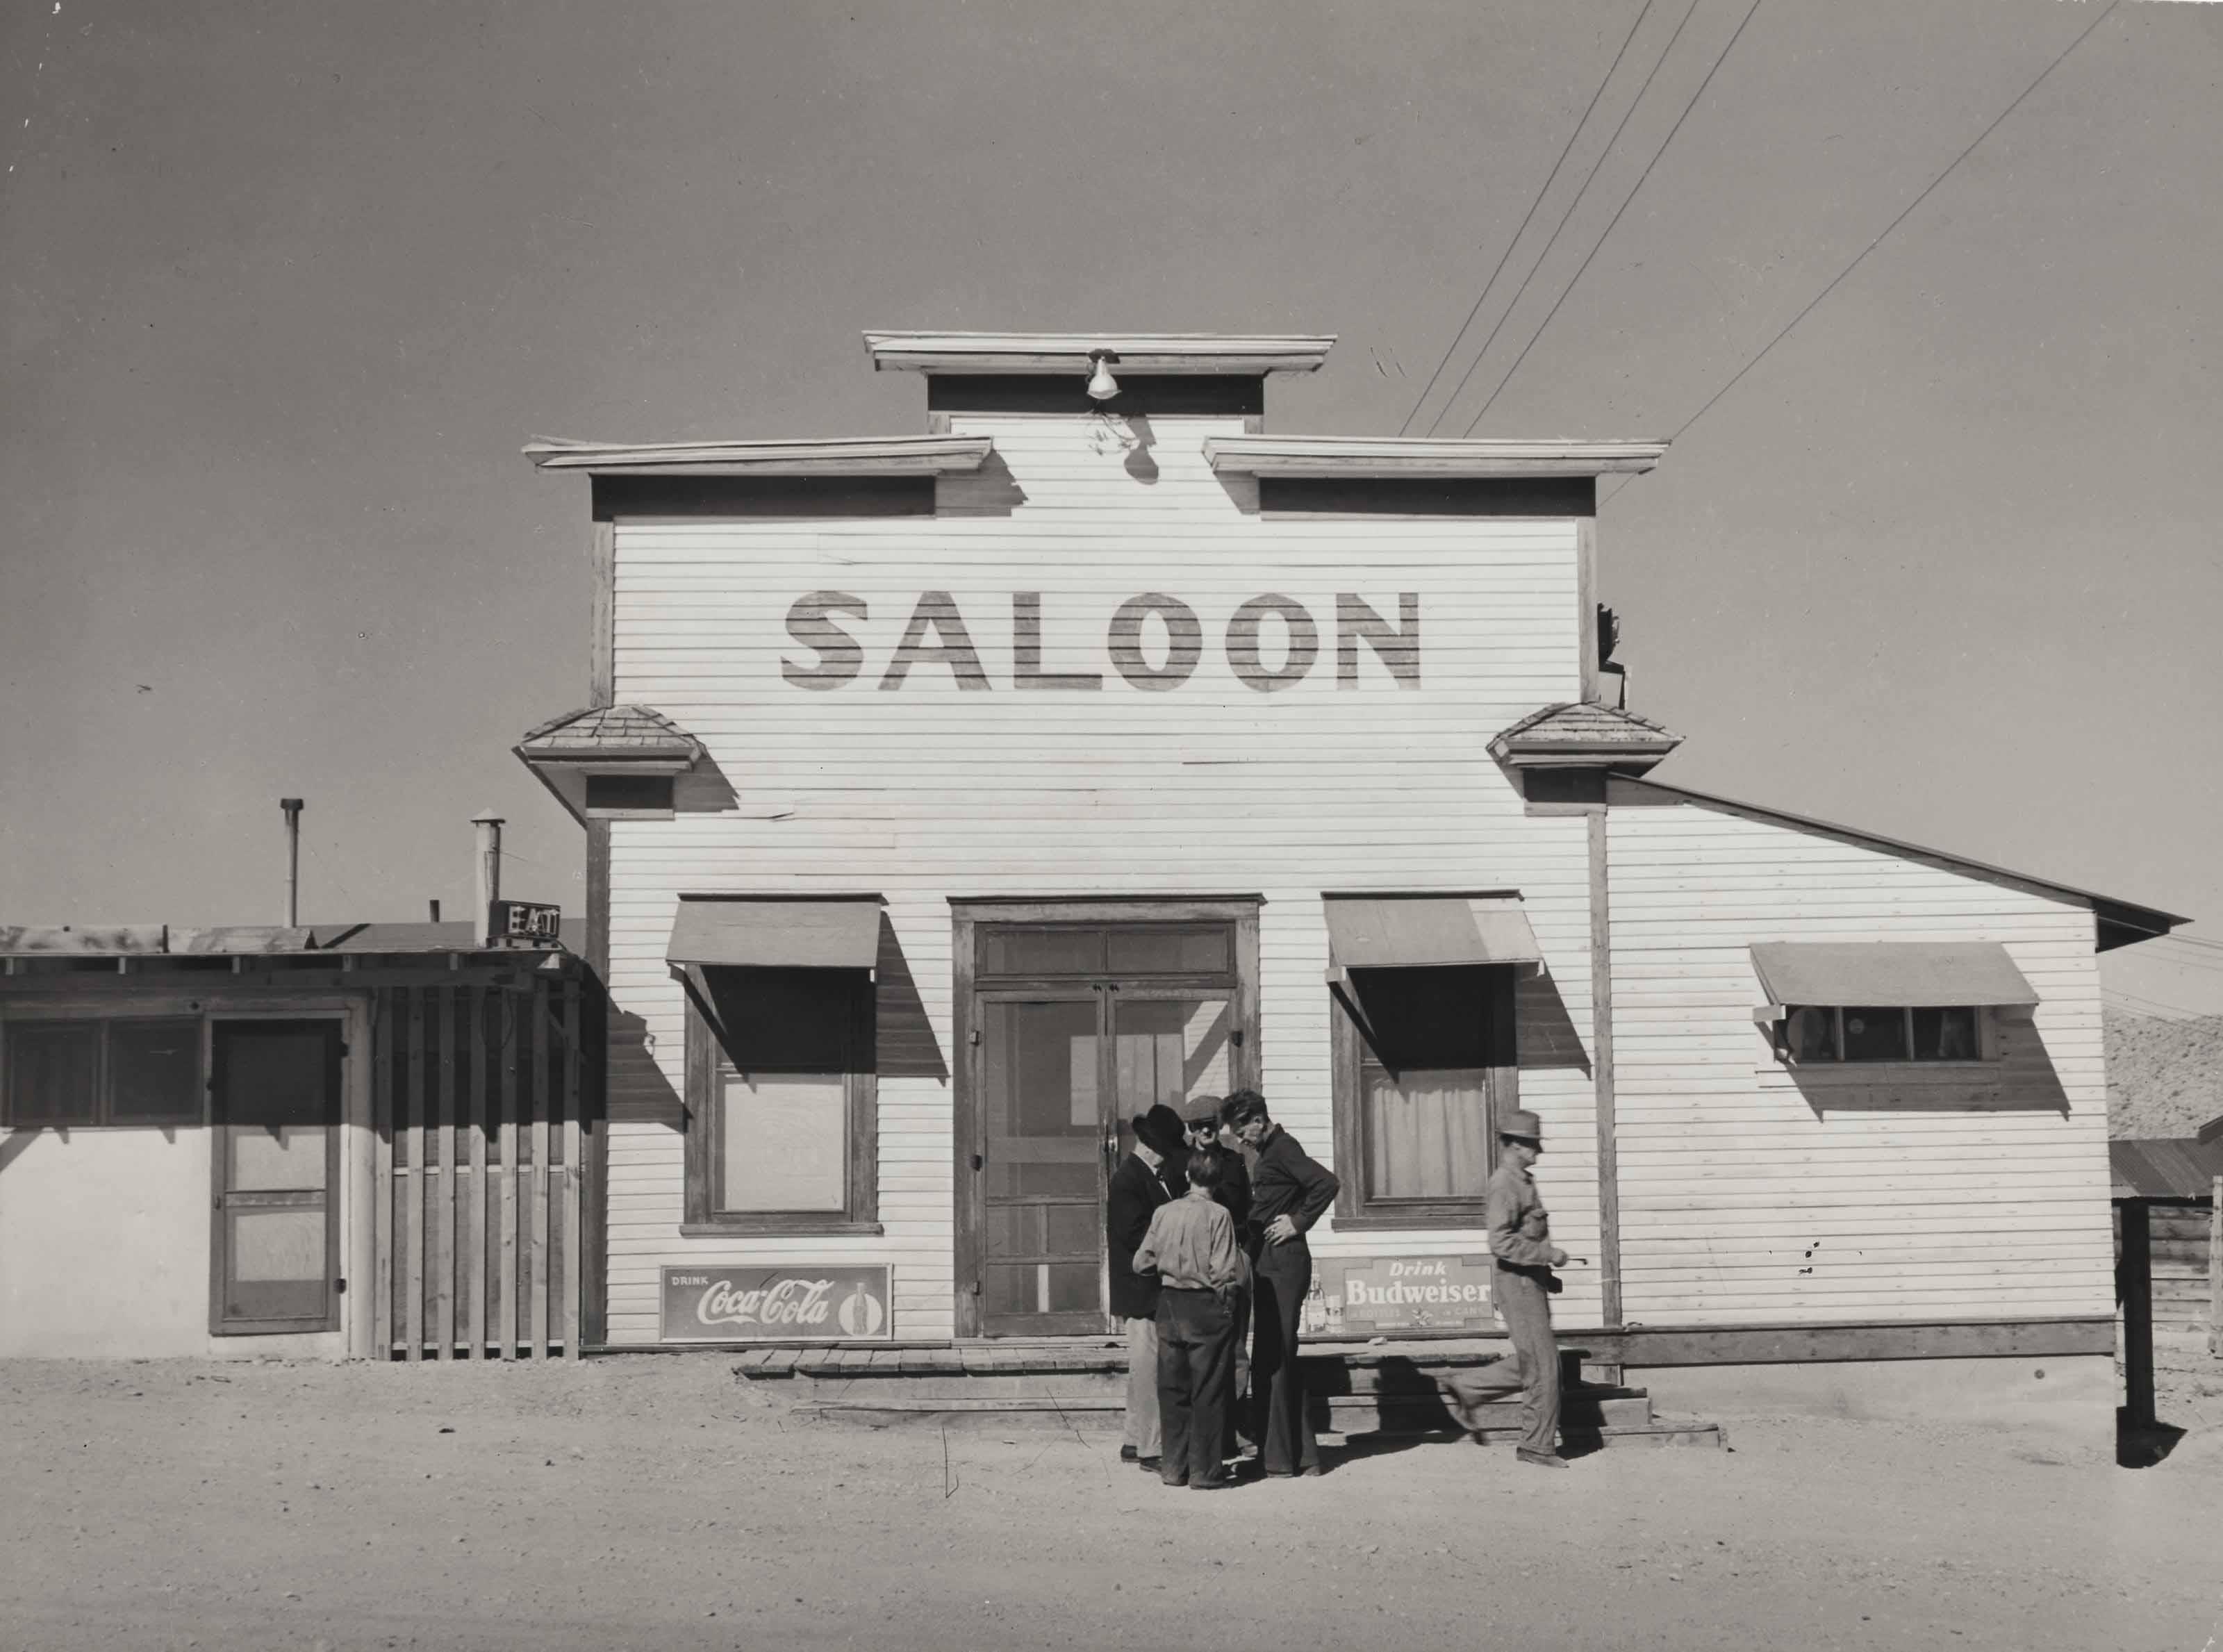 Saloon, Silver Peak, Nevada, March 1940